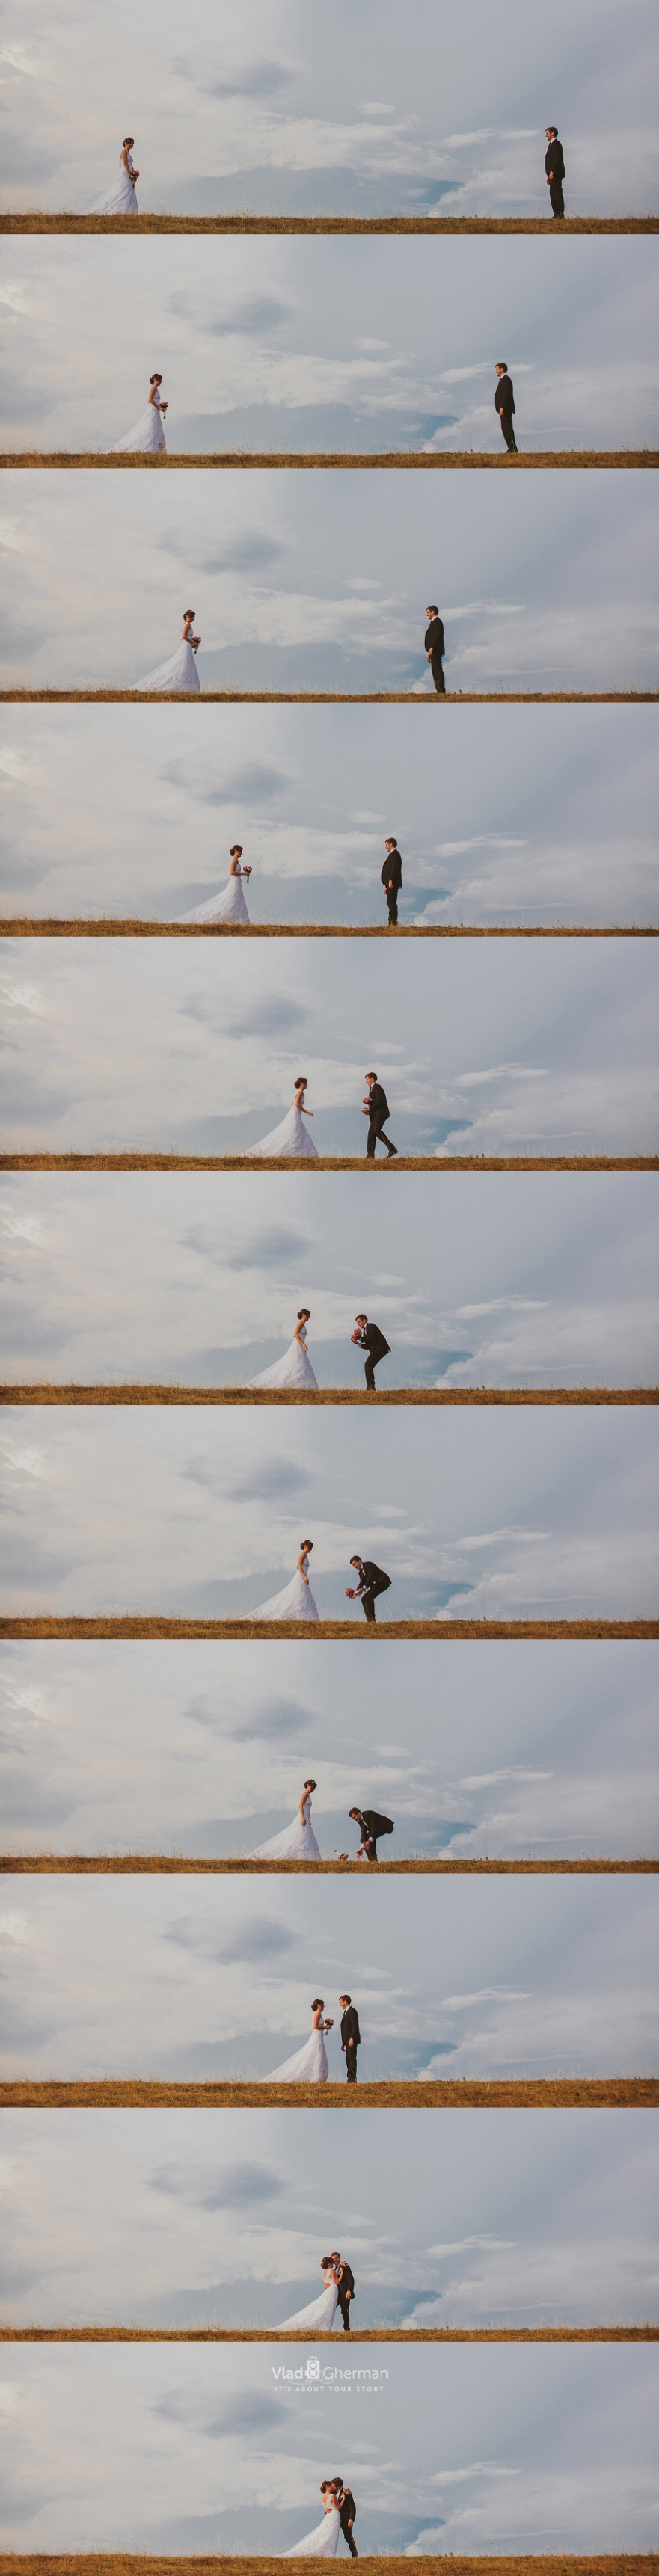 vlad gehrman photography